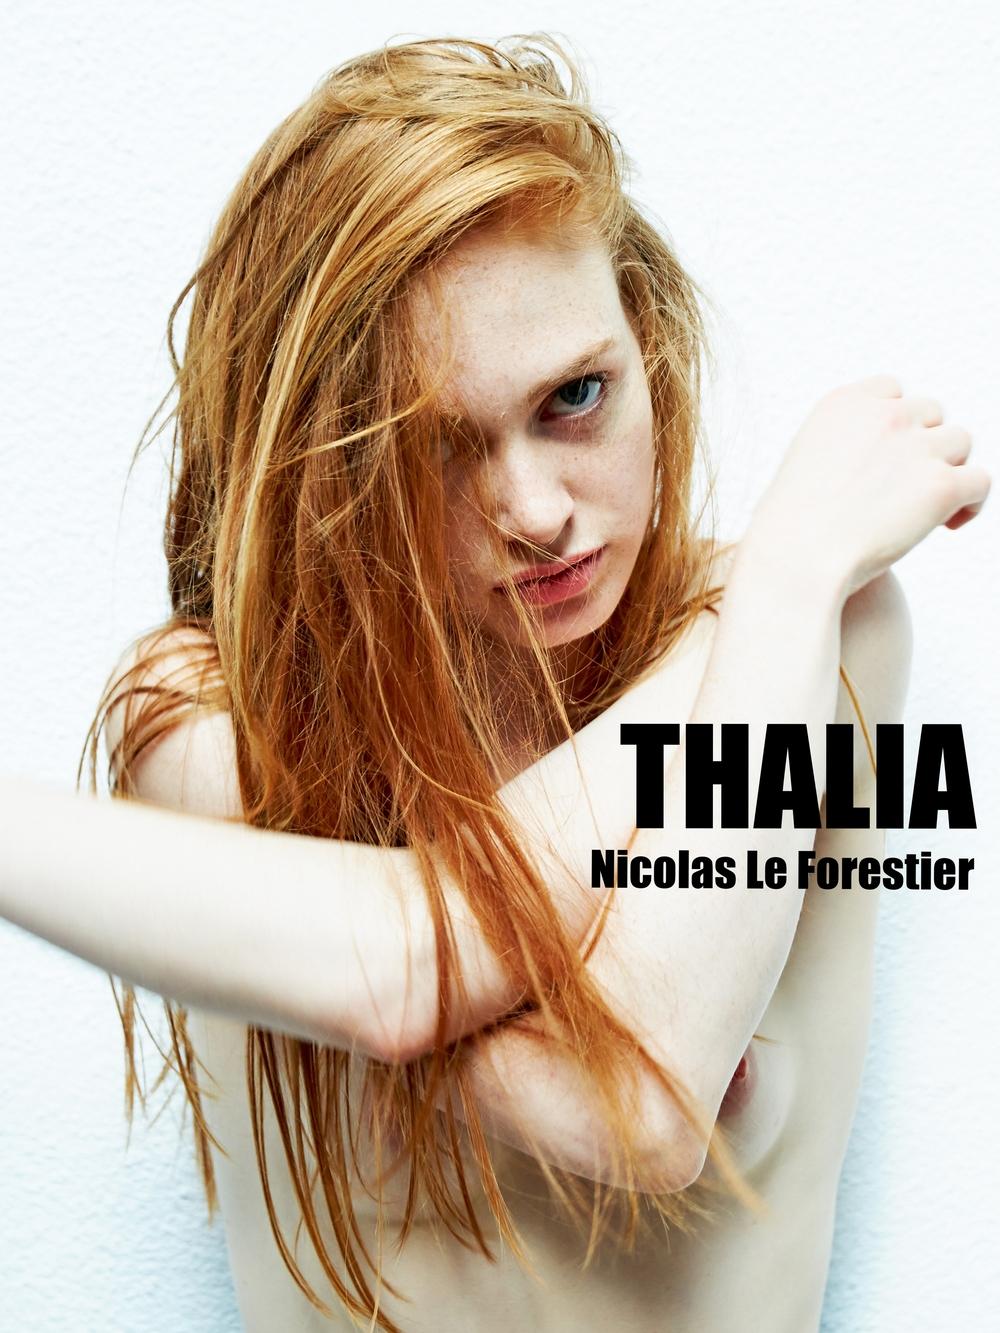 Thalia KellyIMG_0546.jpg